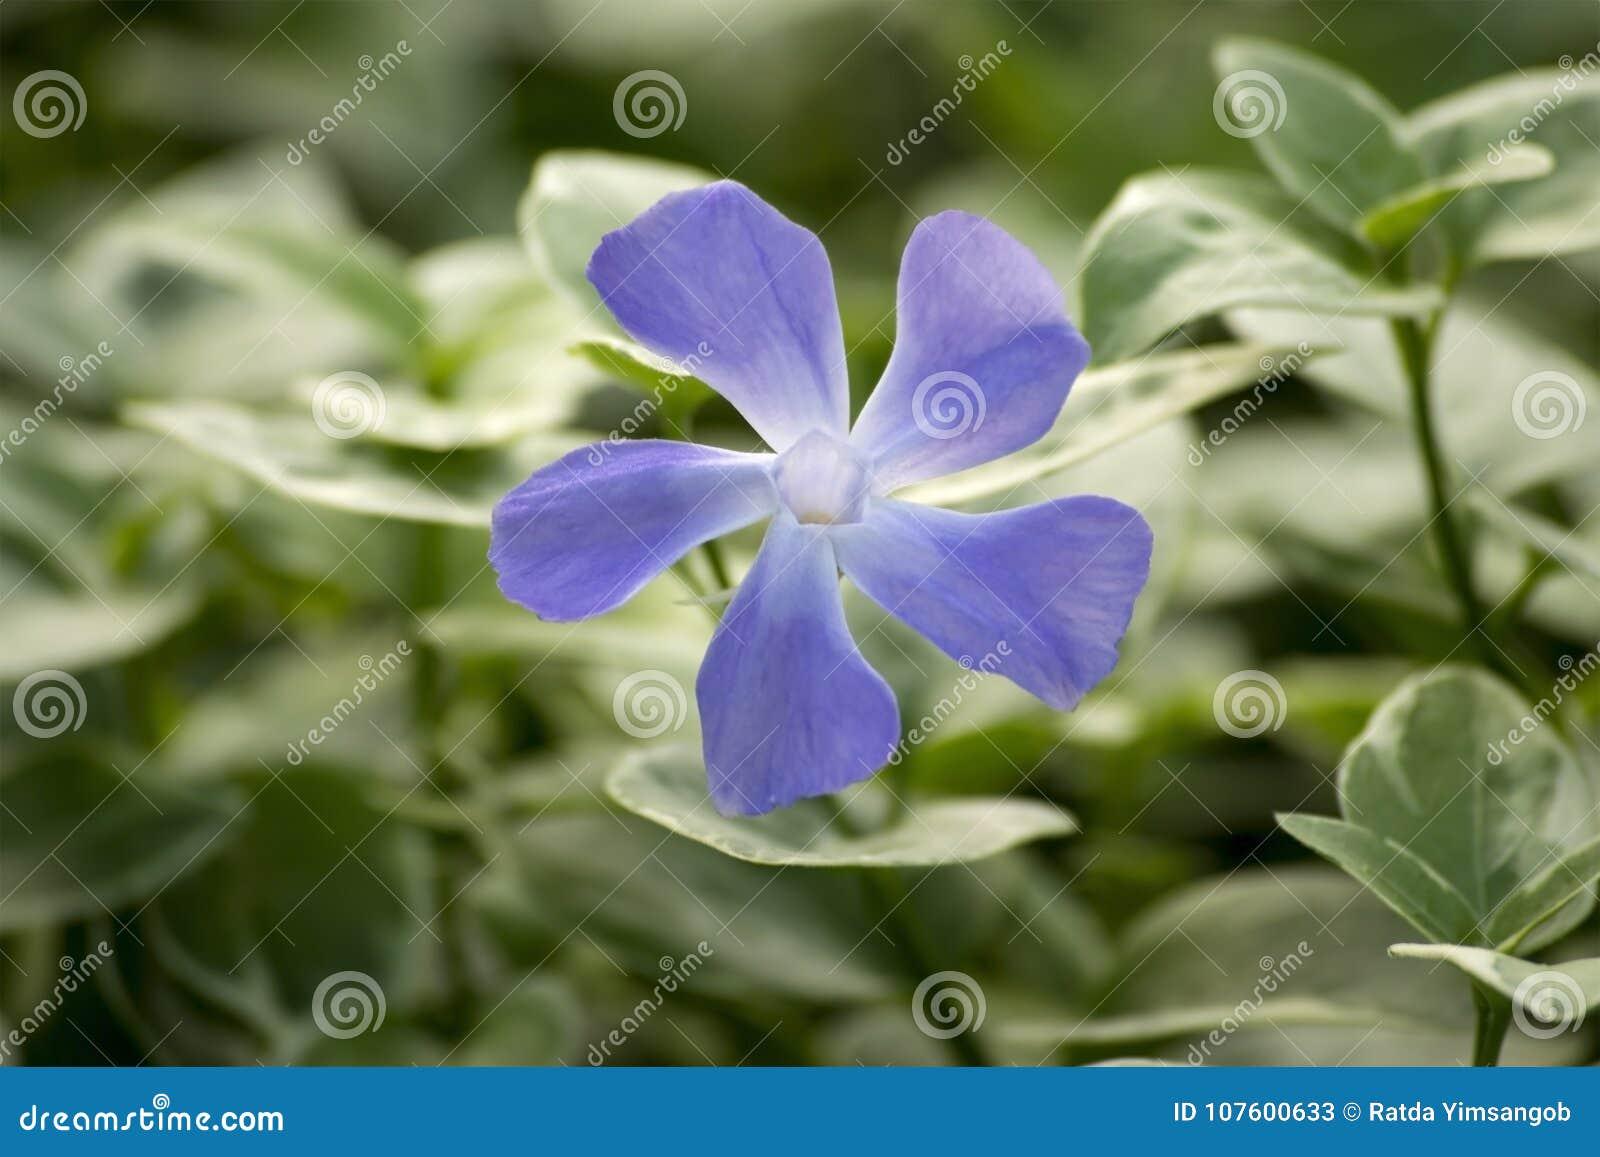 Beautiful Blue Flower Of Vinca Vine Stock Image Image Of Cover